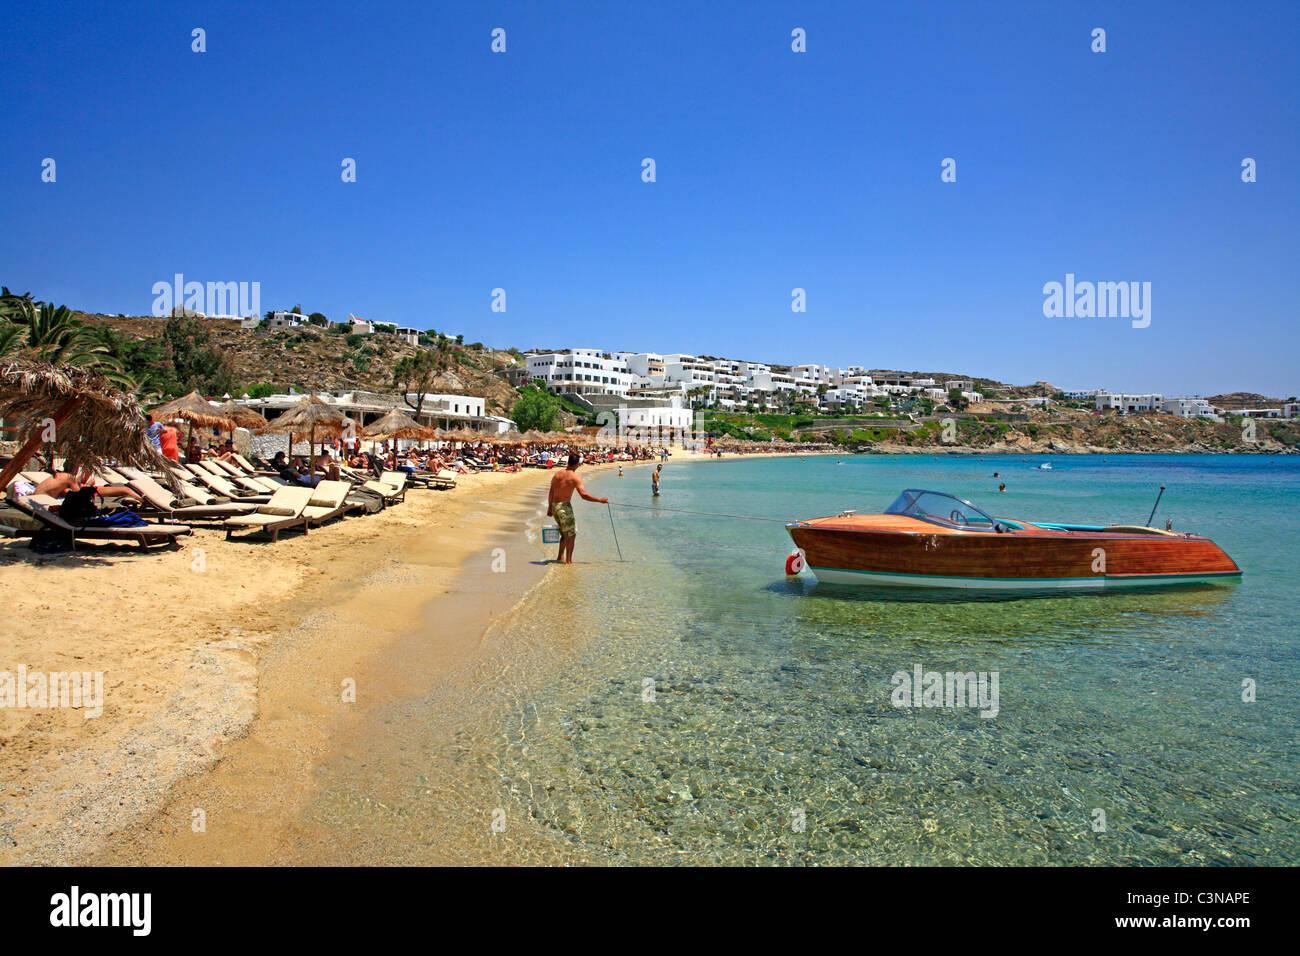 Best Island Beaches For Partying Mykonos St Barts: Super Paradise Beach Greek Cyclades Island Of Mykonos